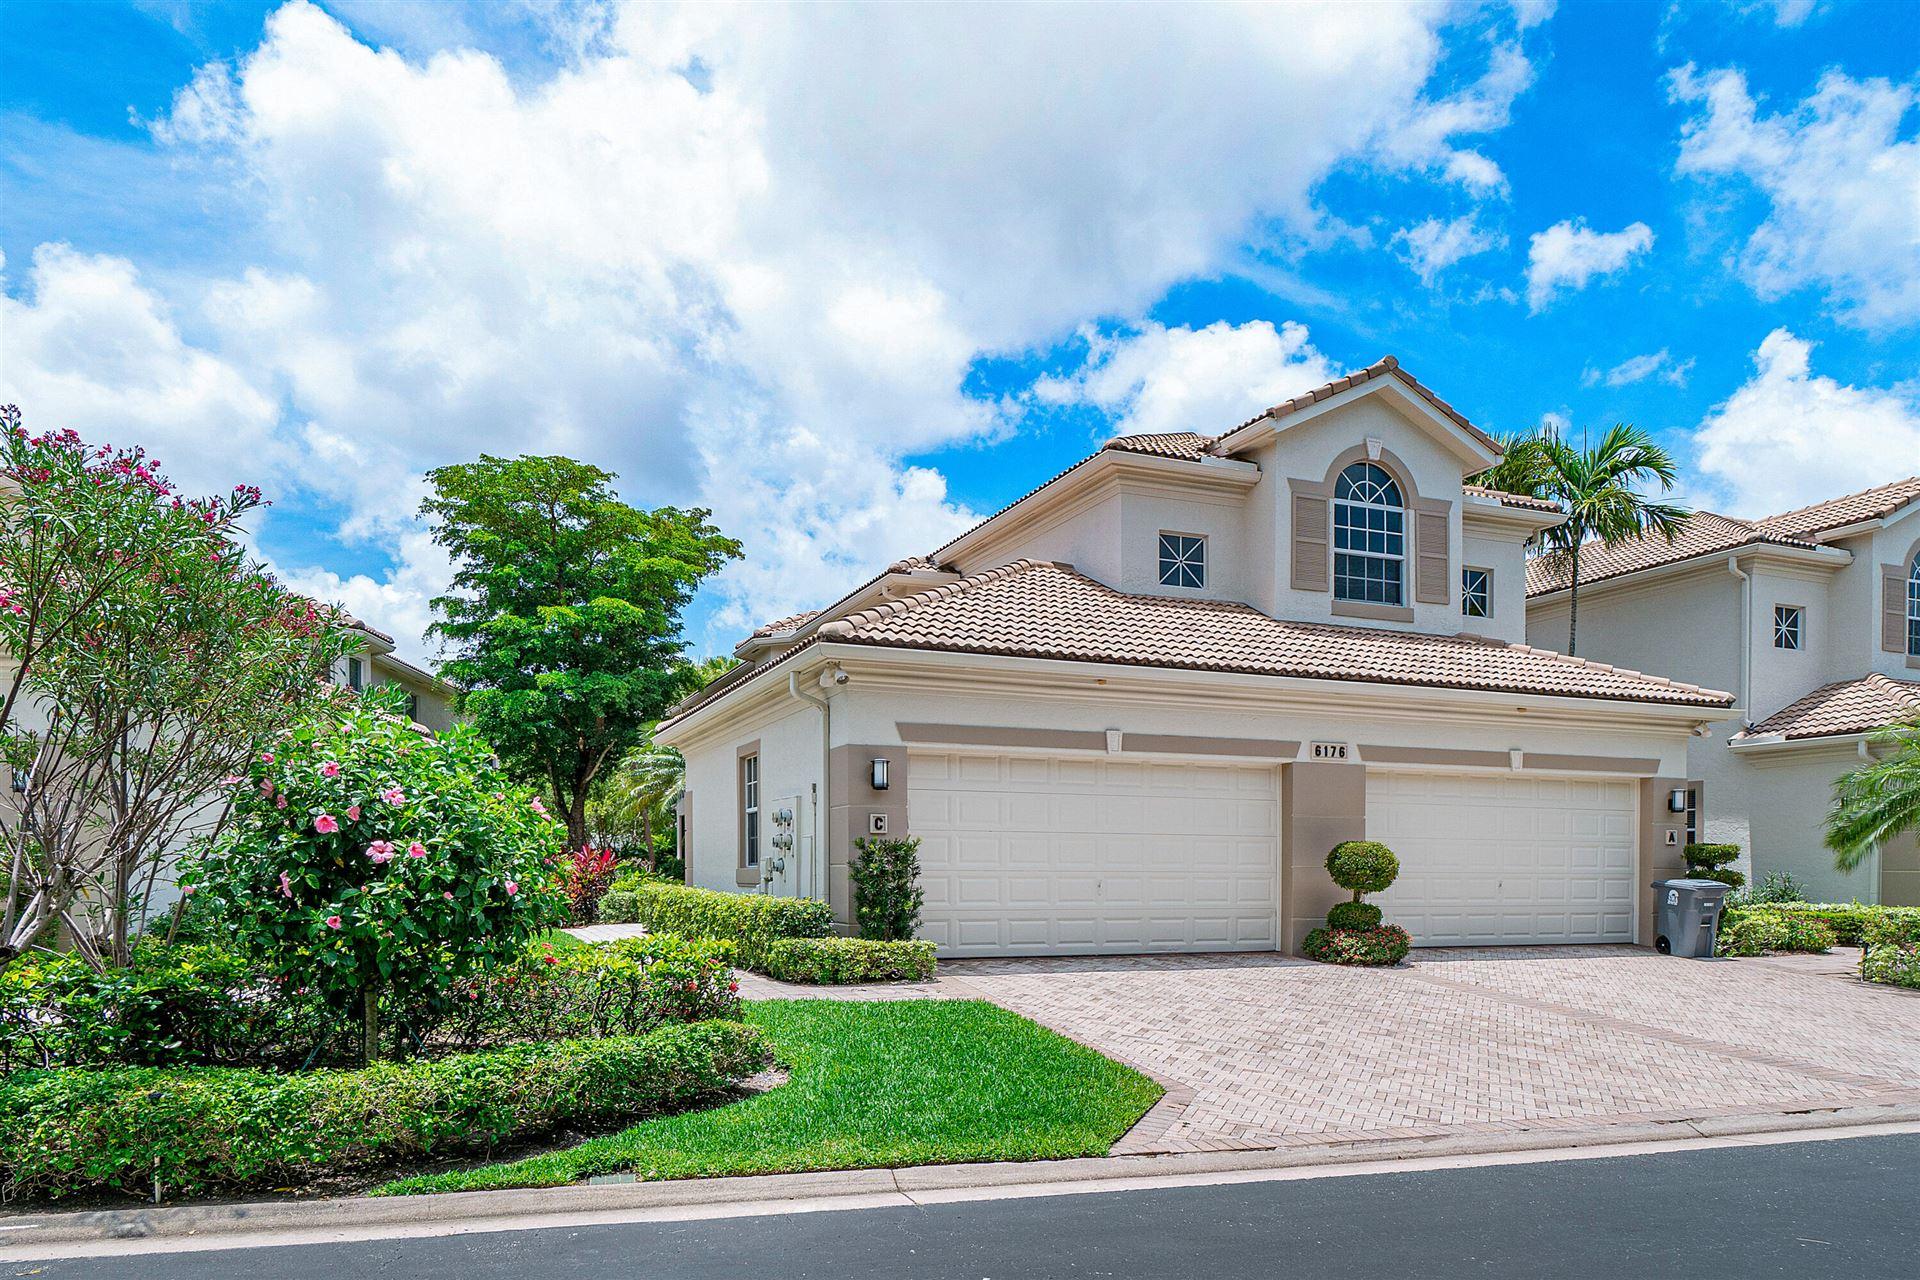 6176 Island Bend #C, Boca Raton, FL 33496 - MLS#: RX-10722504